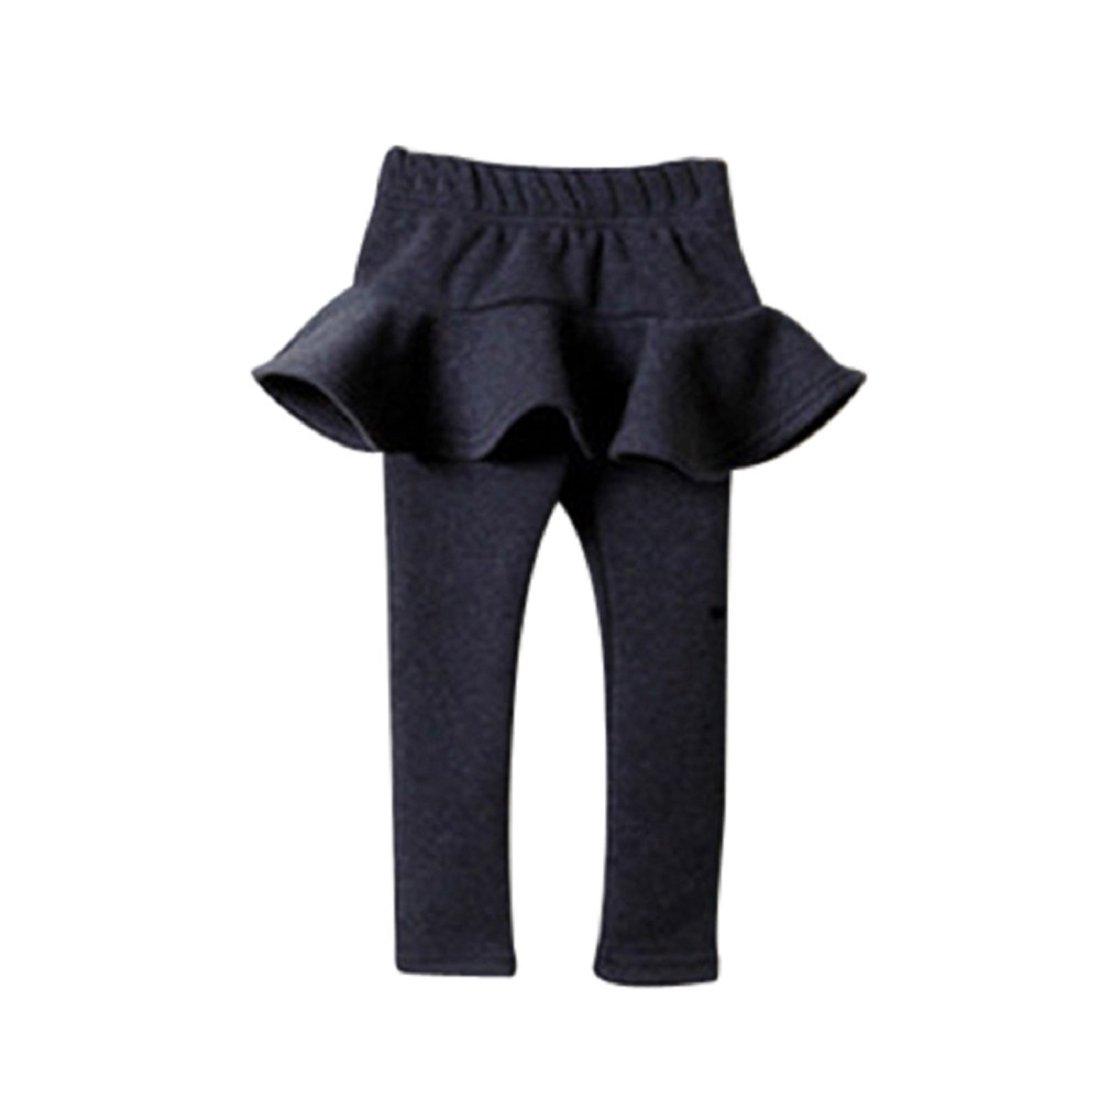 GONKOMA Warm Winter Girls Pants Children Thick Warm Elastic Waist Leggings (2-Years Old, Dark Gray)